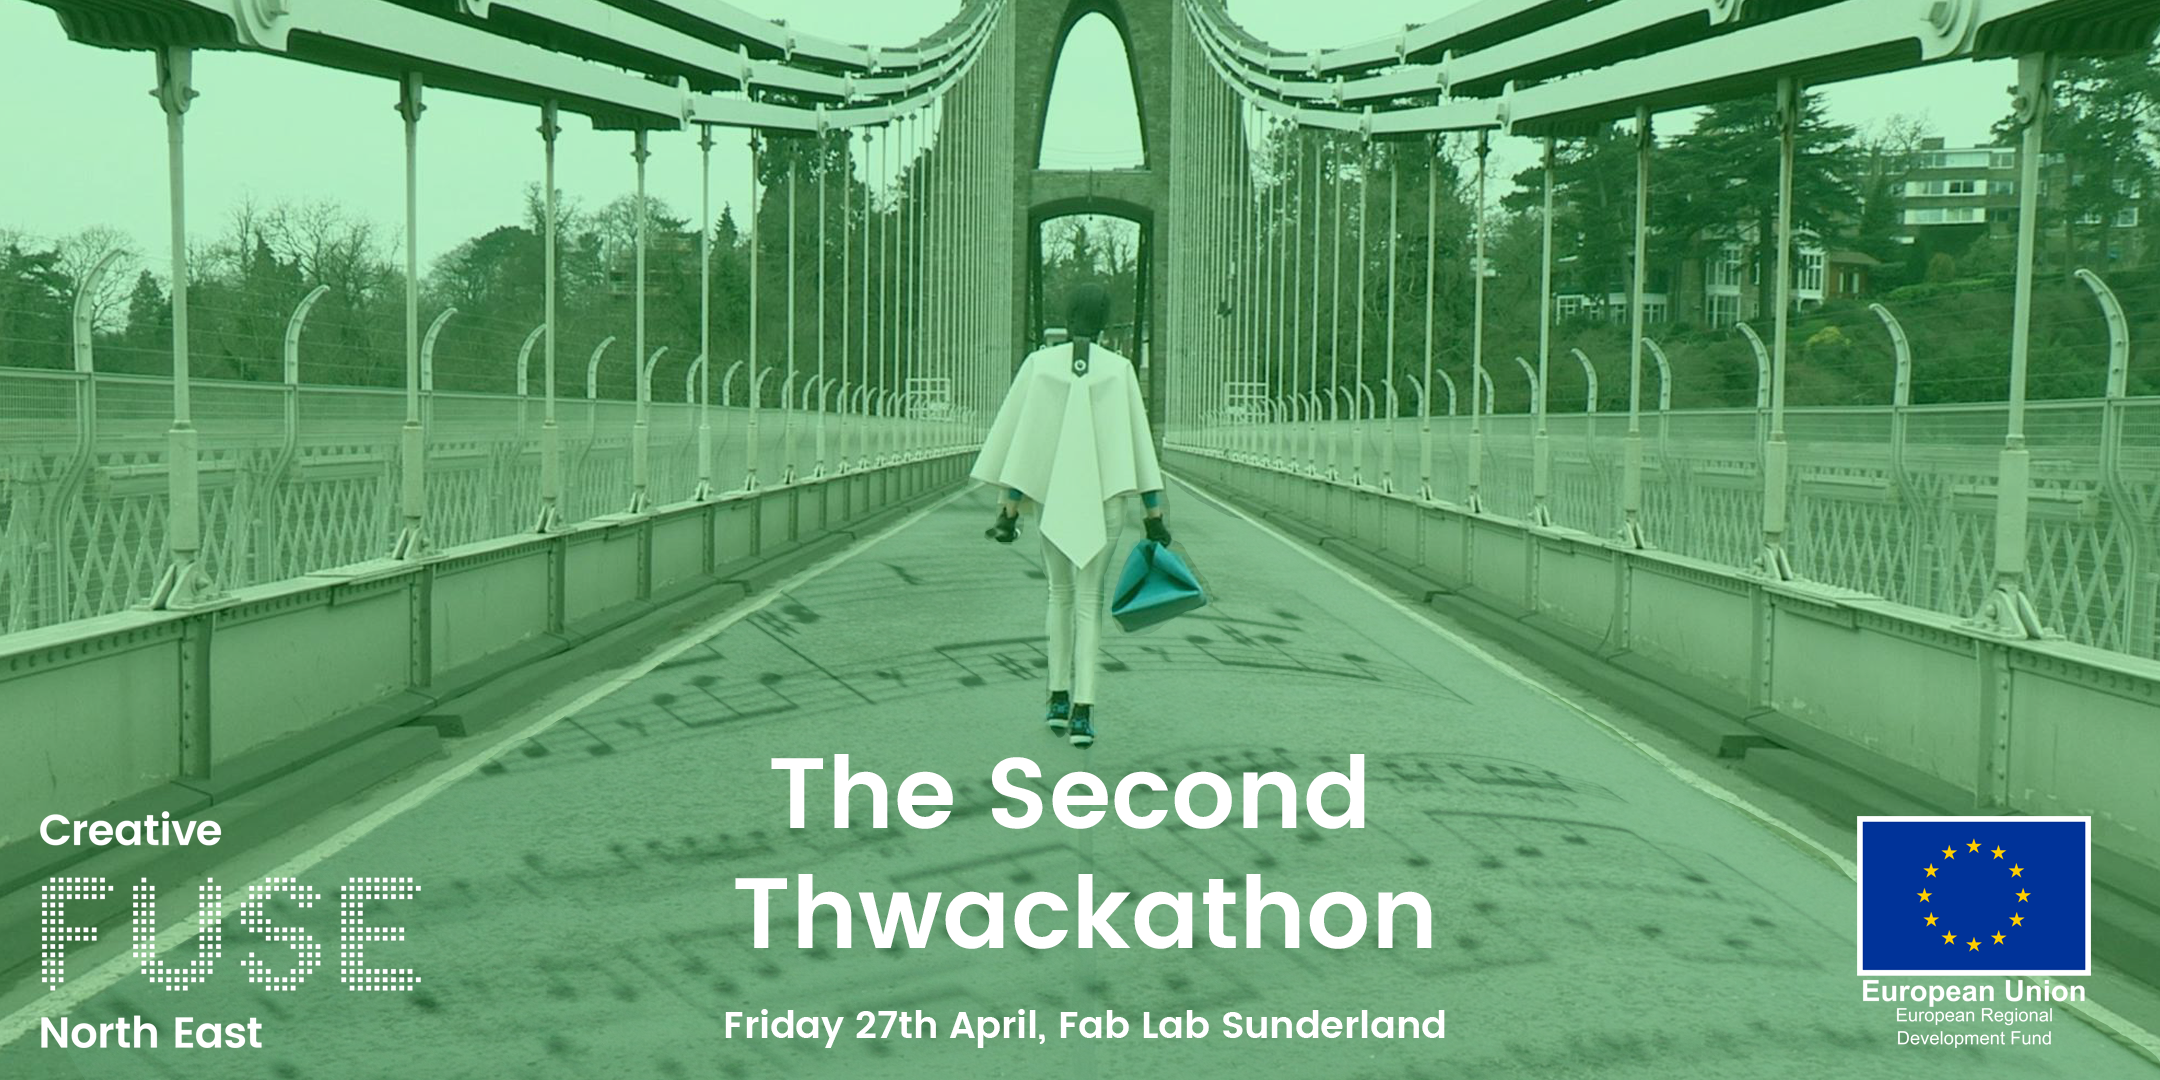 The Second Thwackathon